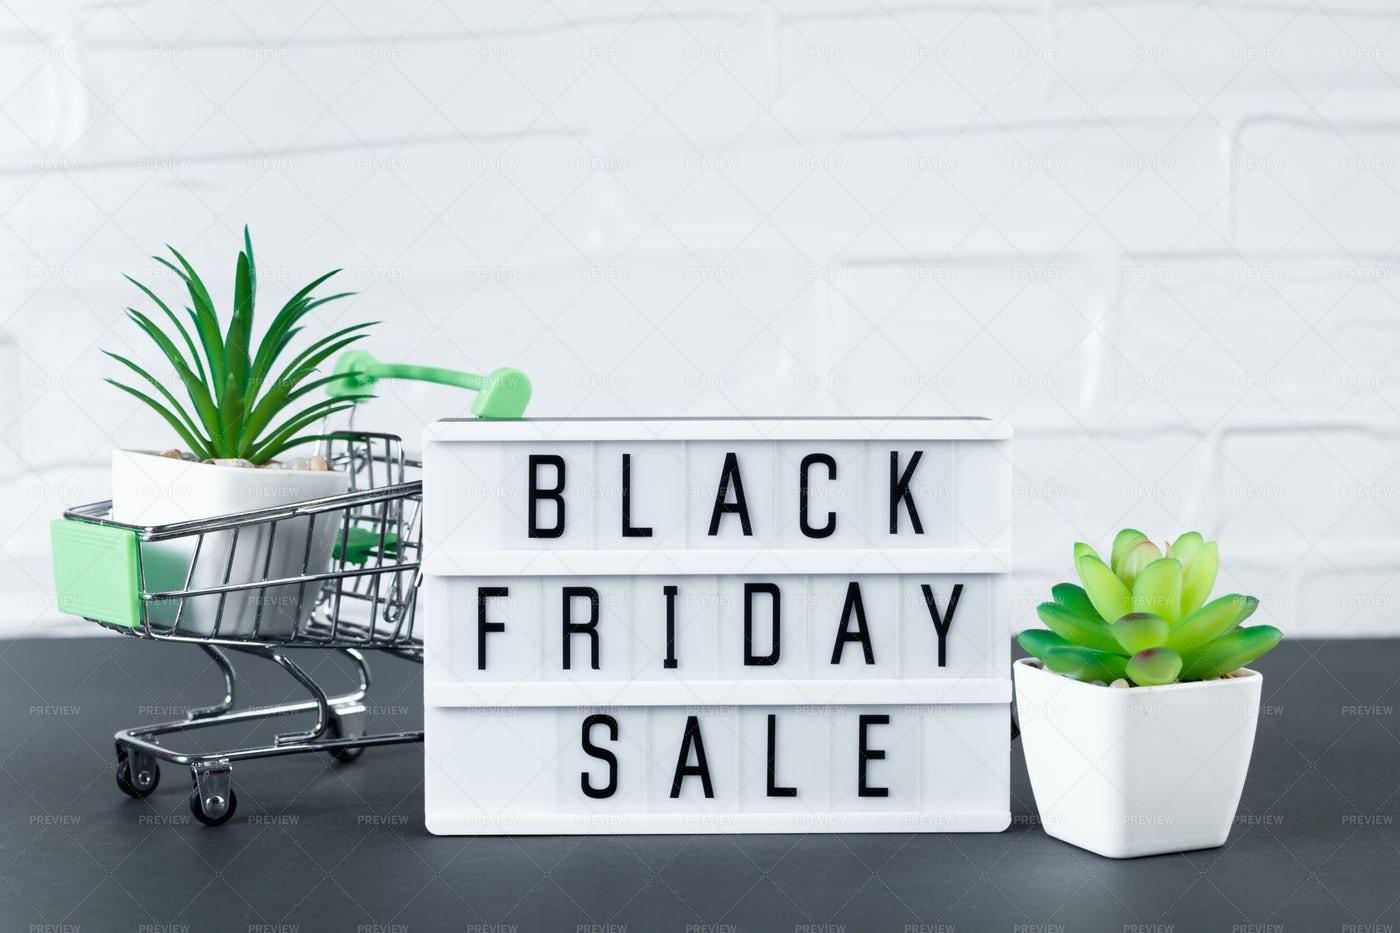 Black Friday Sale: Stock Photos